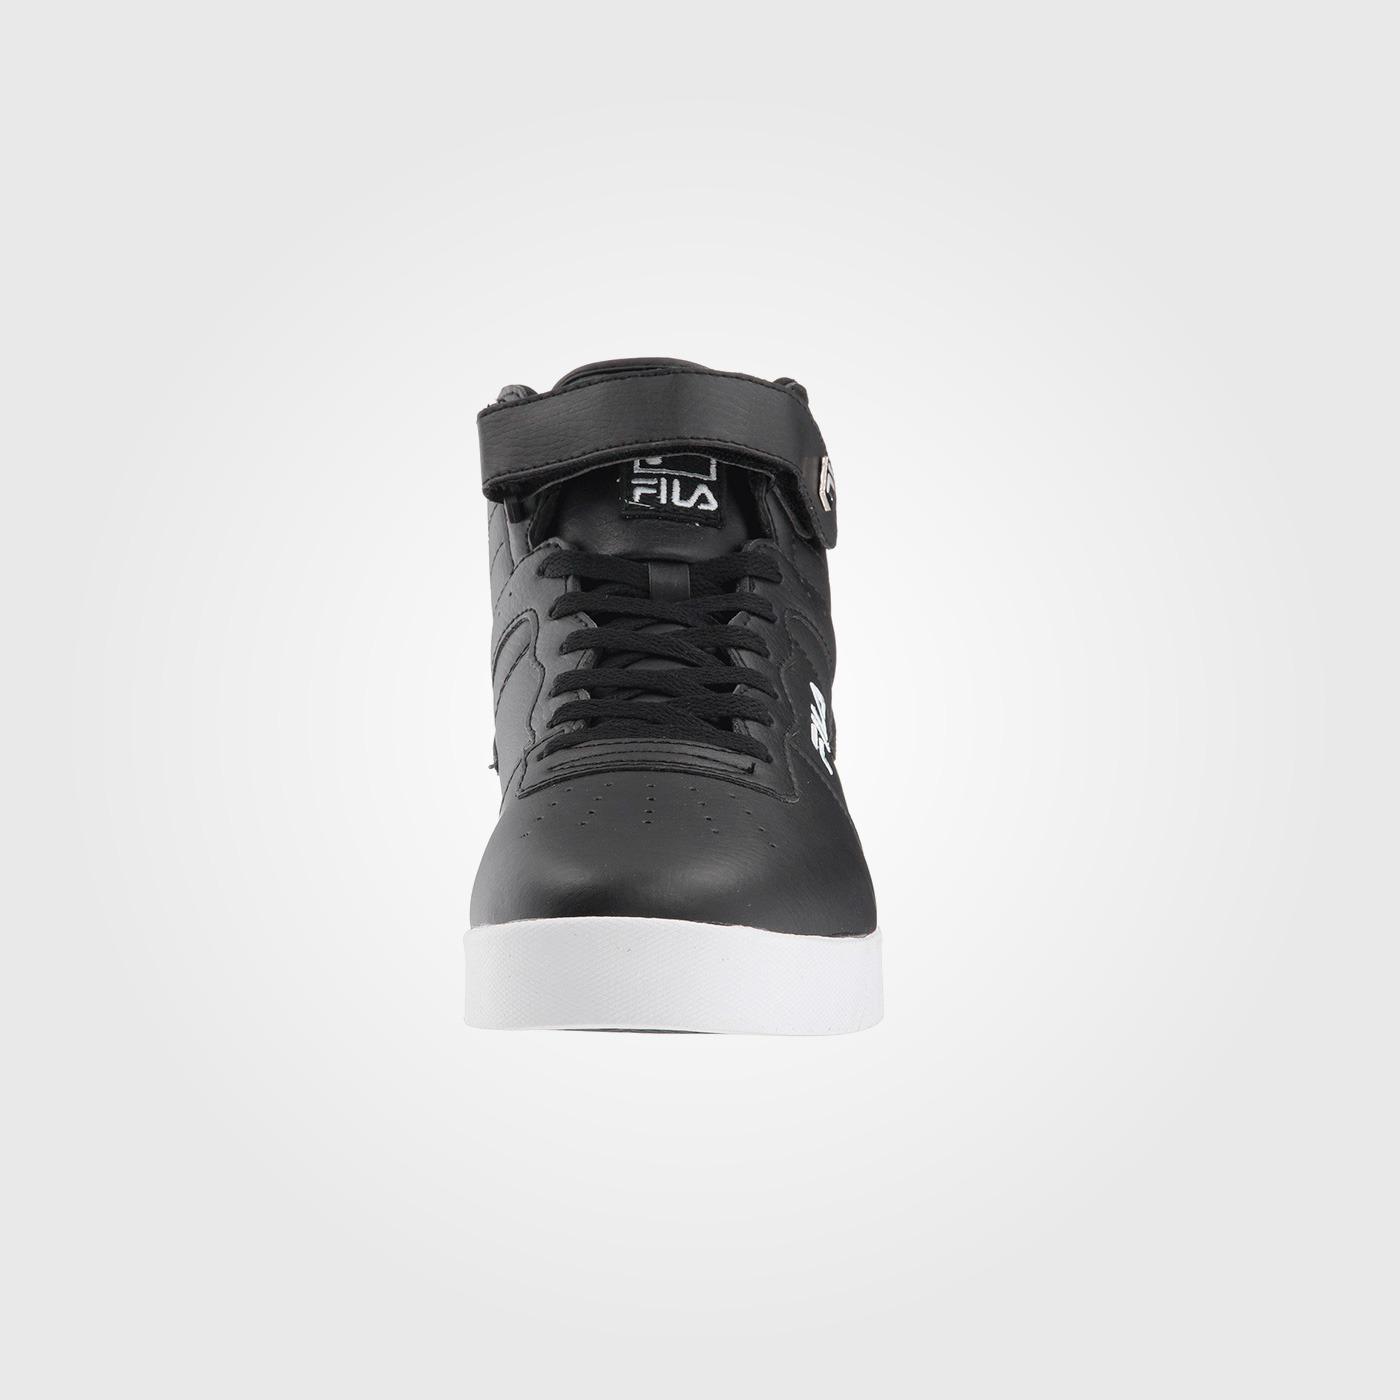 Кроссовки Fila Vulc 13 Mid Plus Black/White